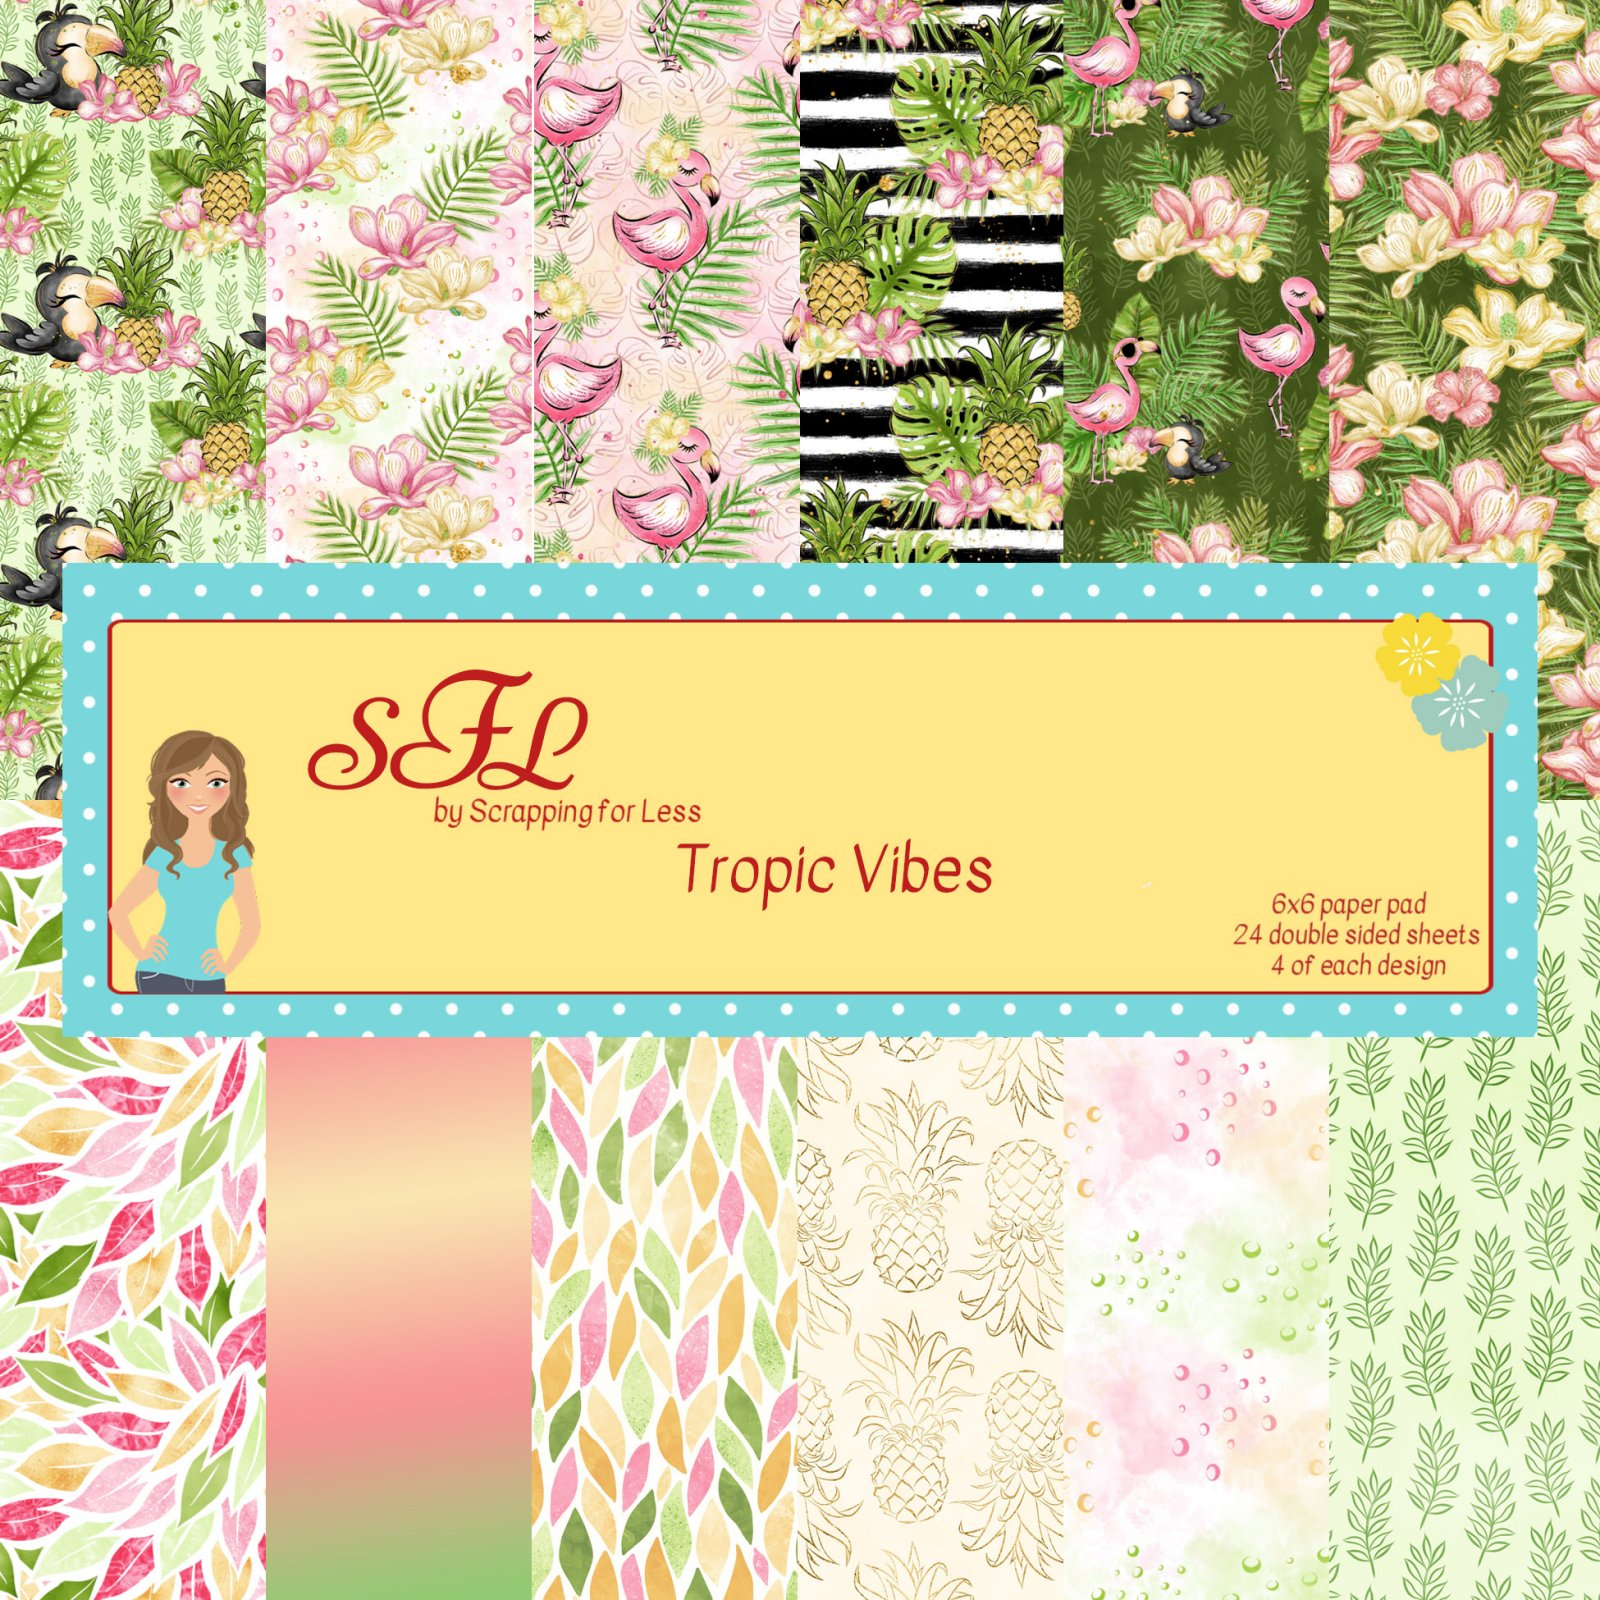 SFL Tropic Vibes 6x6 Paper Pad